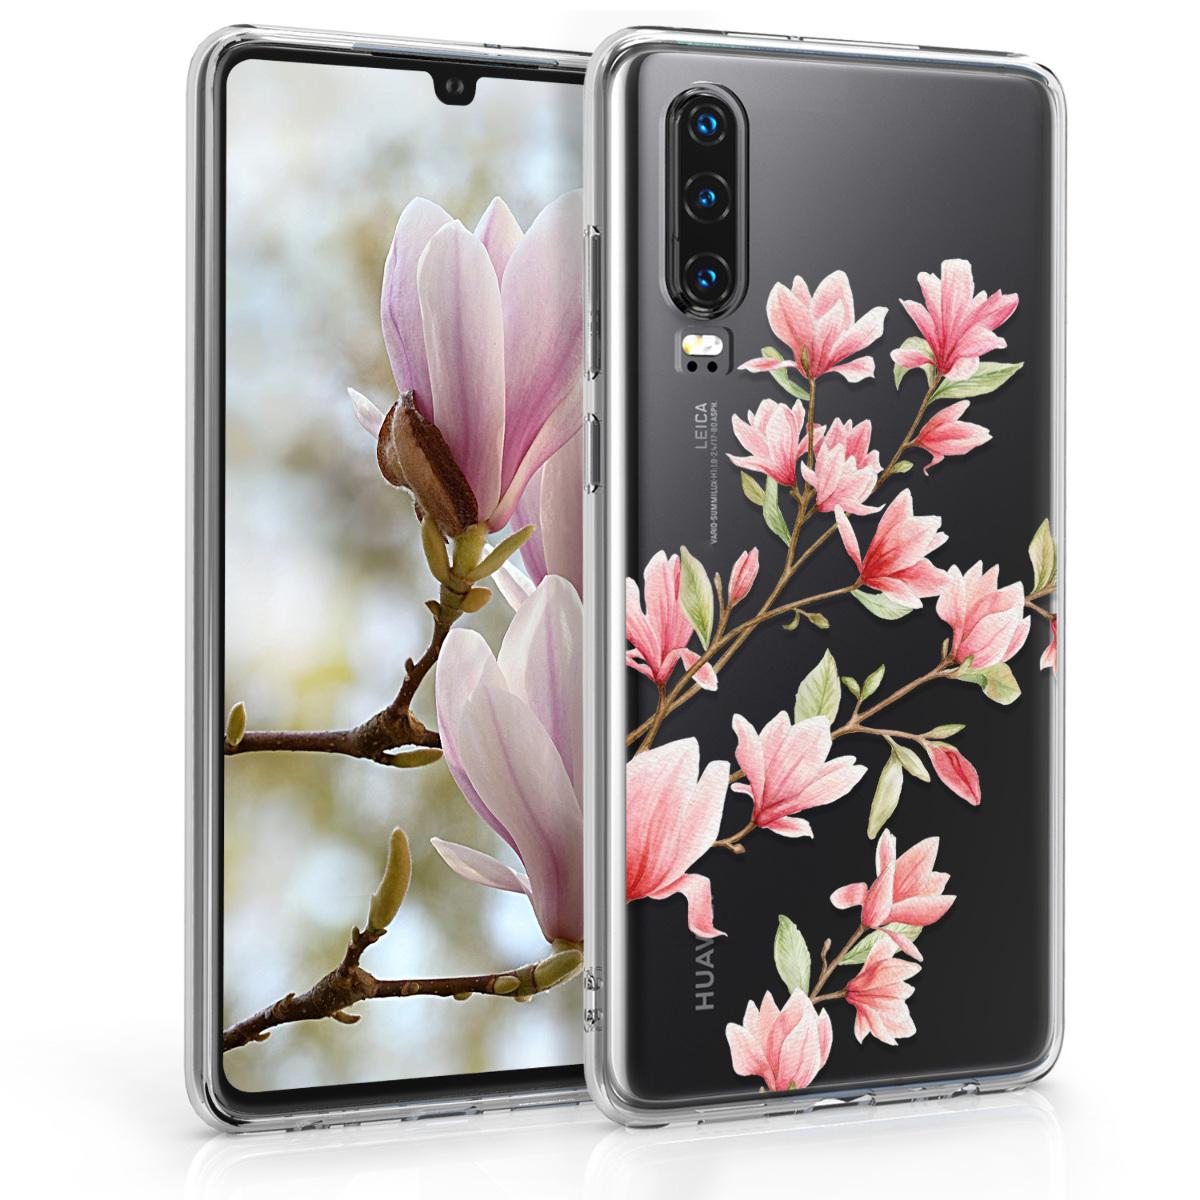 KW Θήκη Σιλικόνης Huawei P30 -  Light Pink / White / Transparent (47412.04)